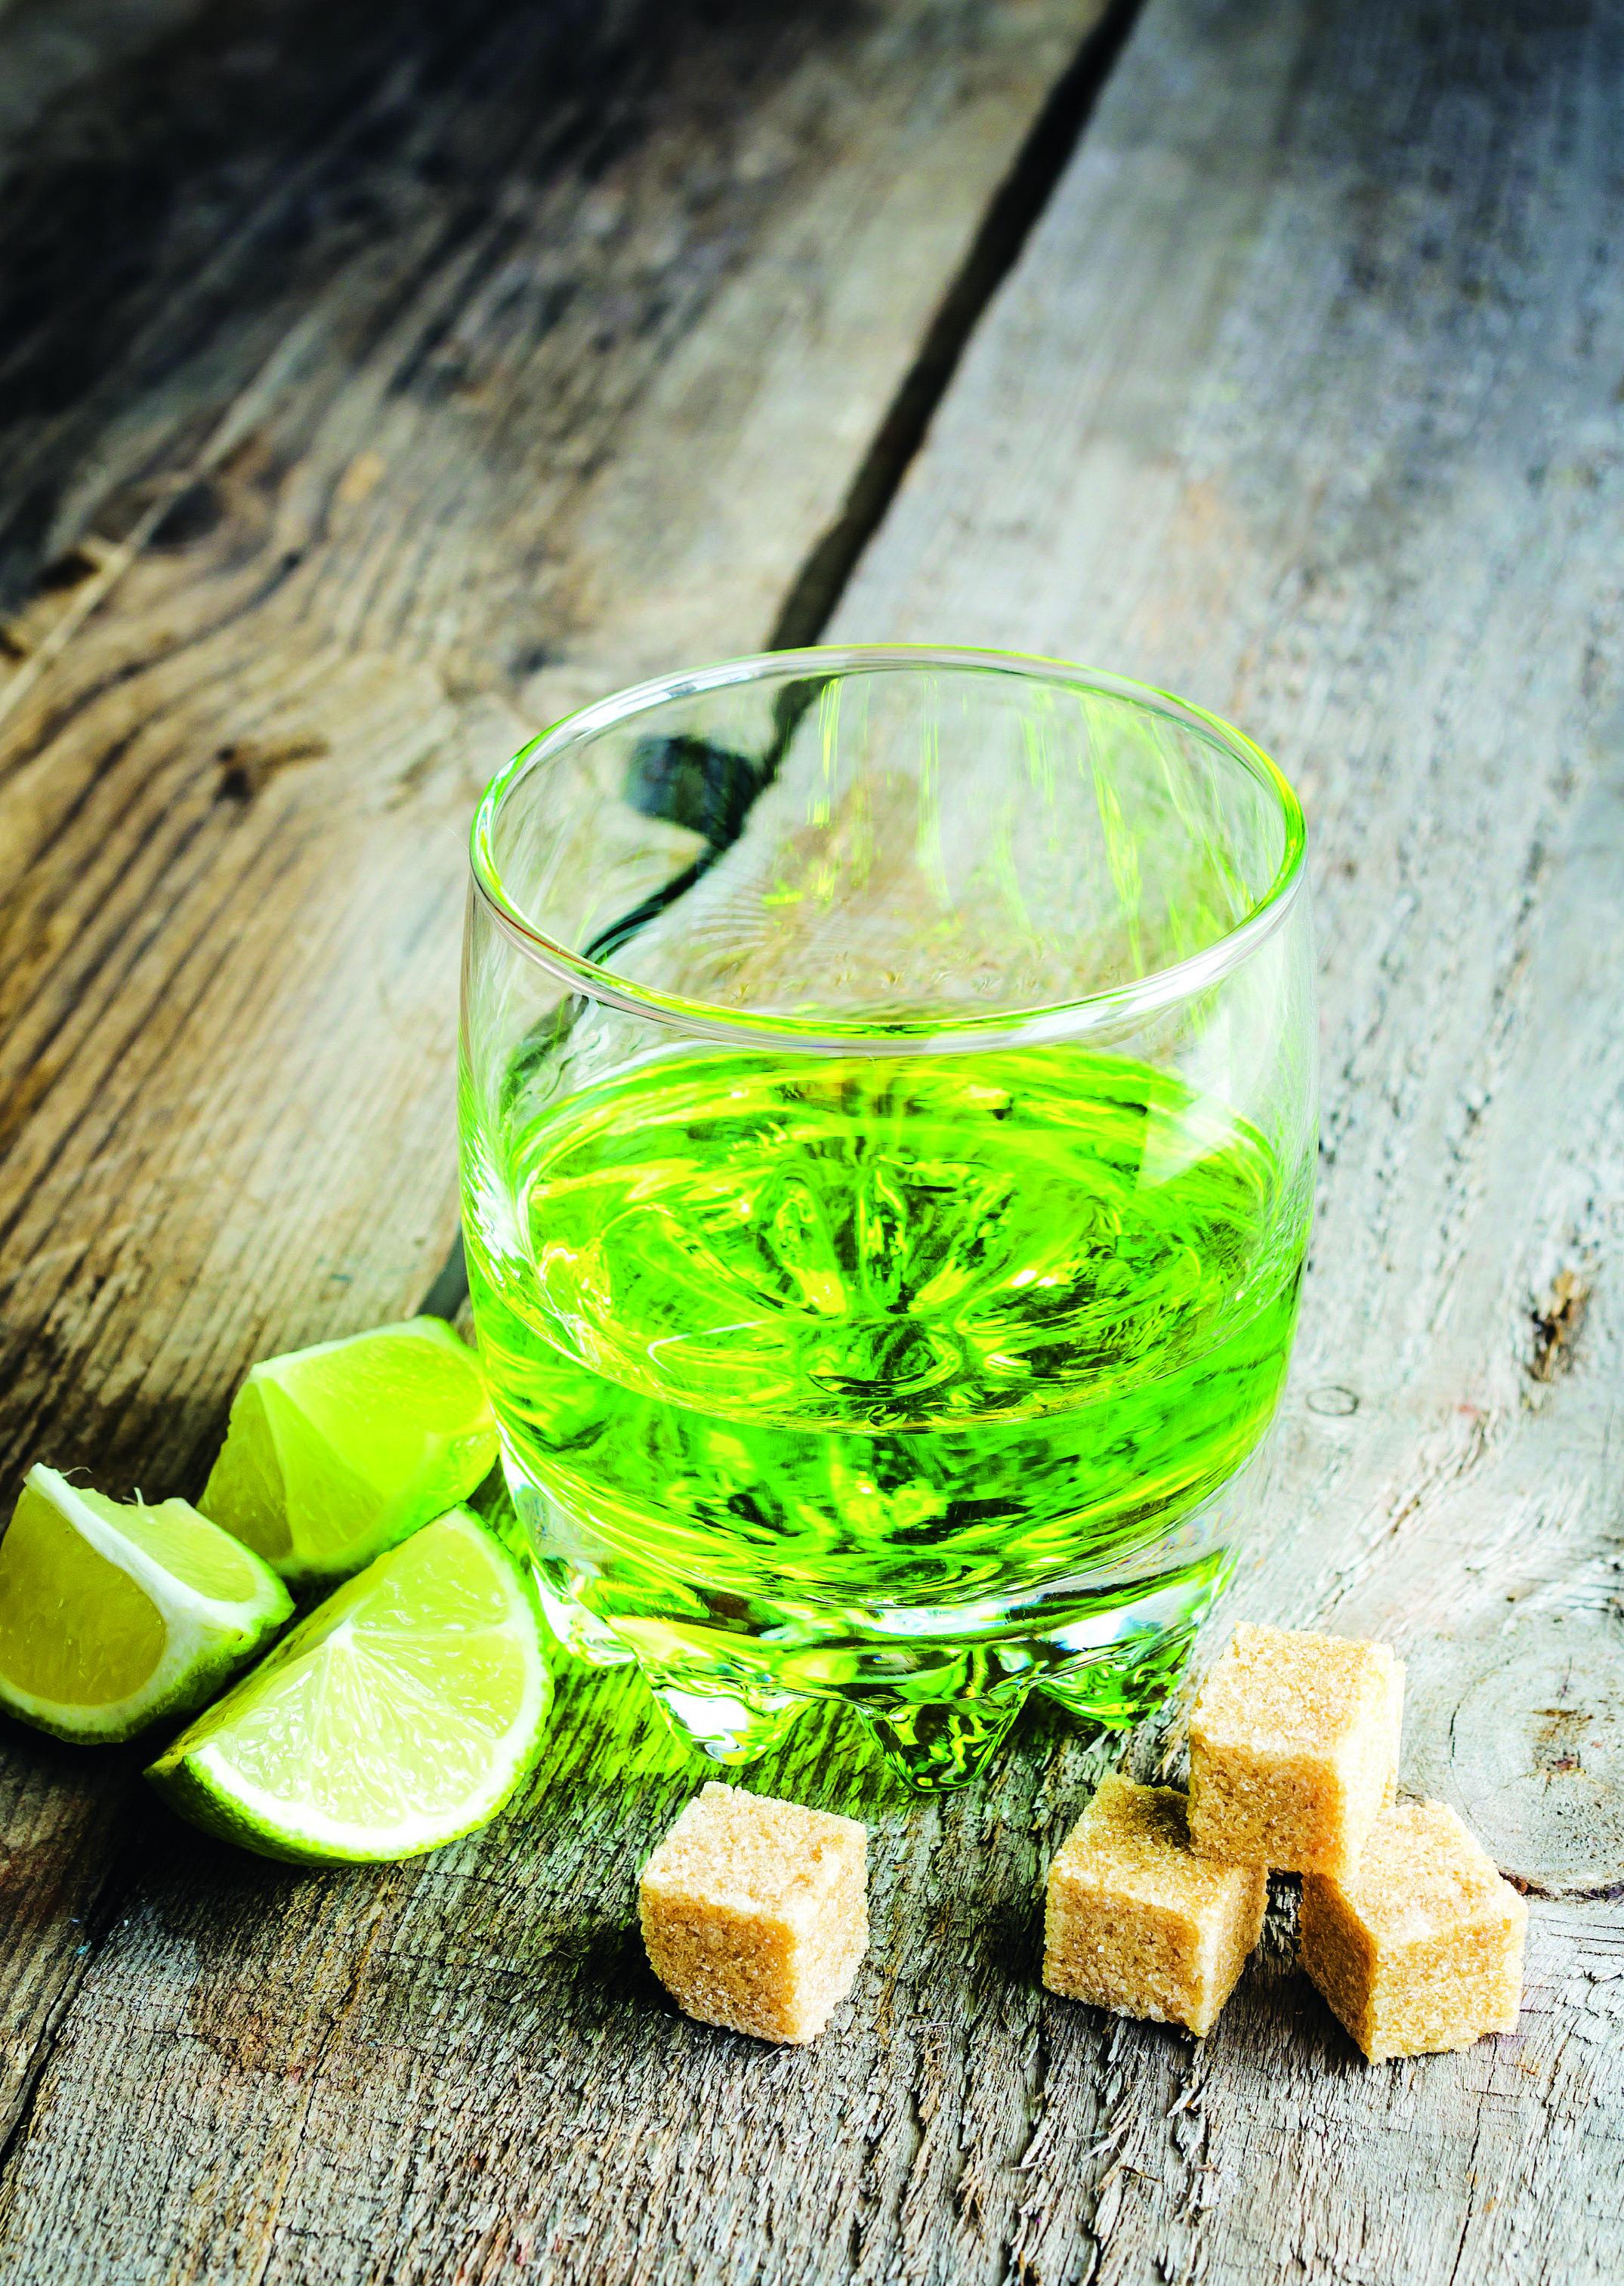 The bitter medicine: wormwood beyond absinthe